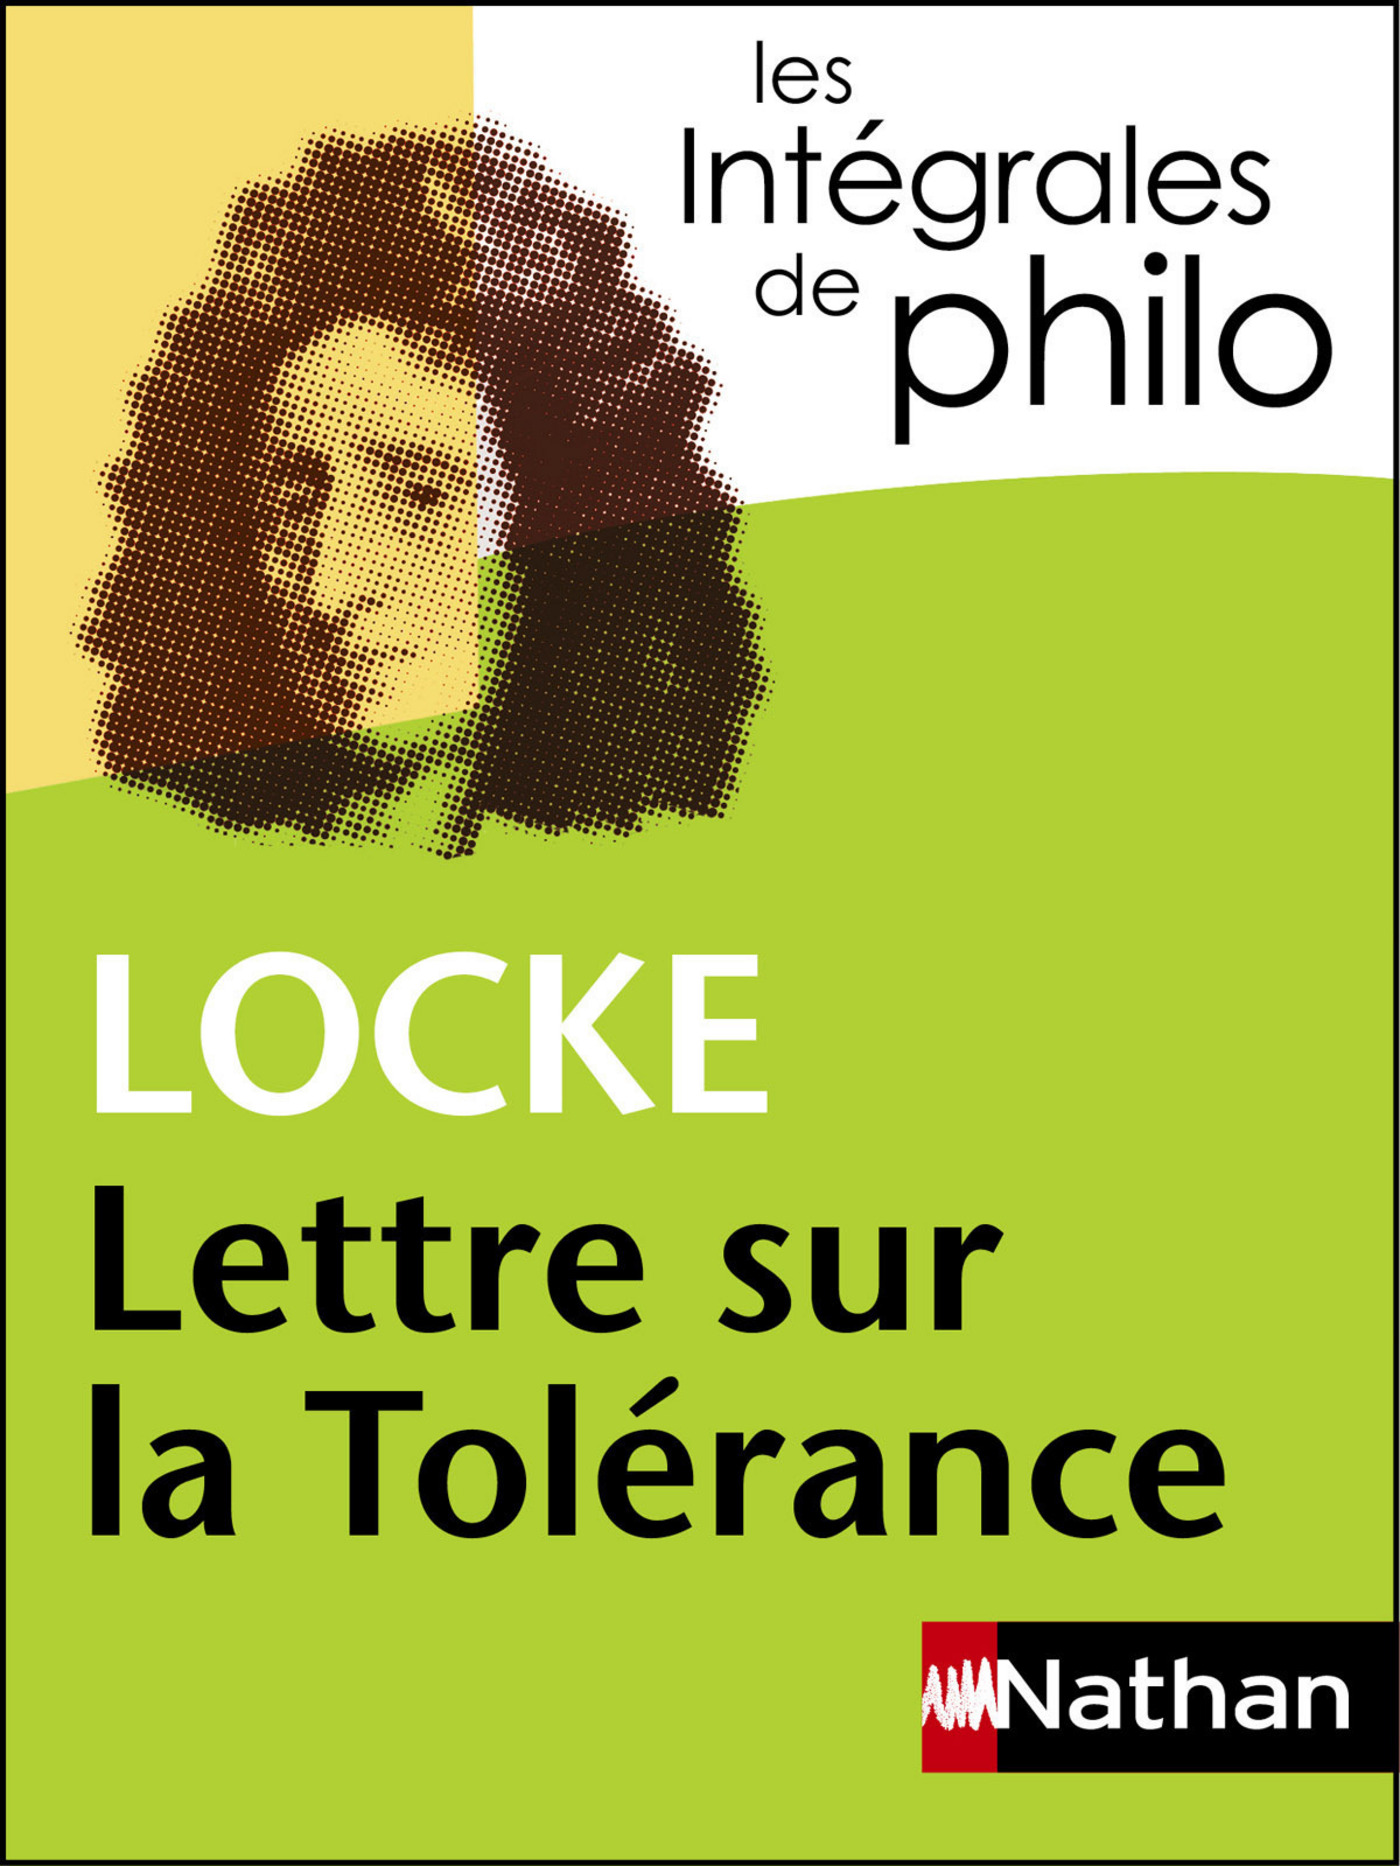 Intégrales de Philo - LOCKE, Lettre sur la Tolérance